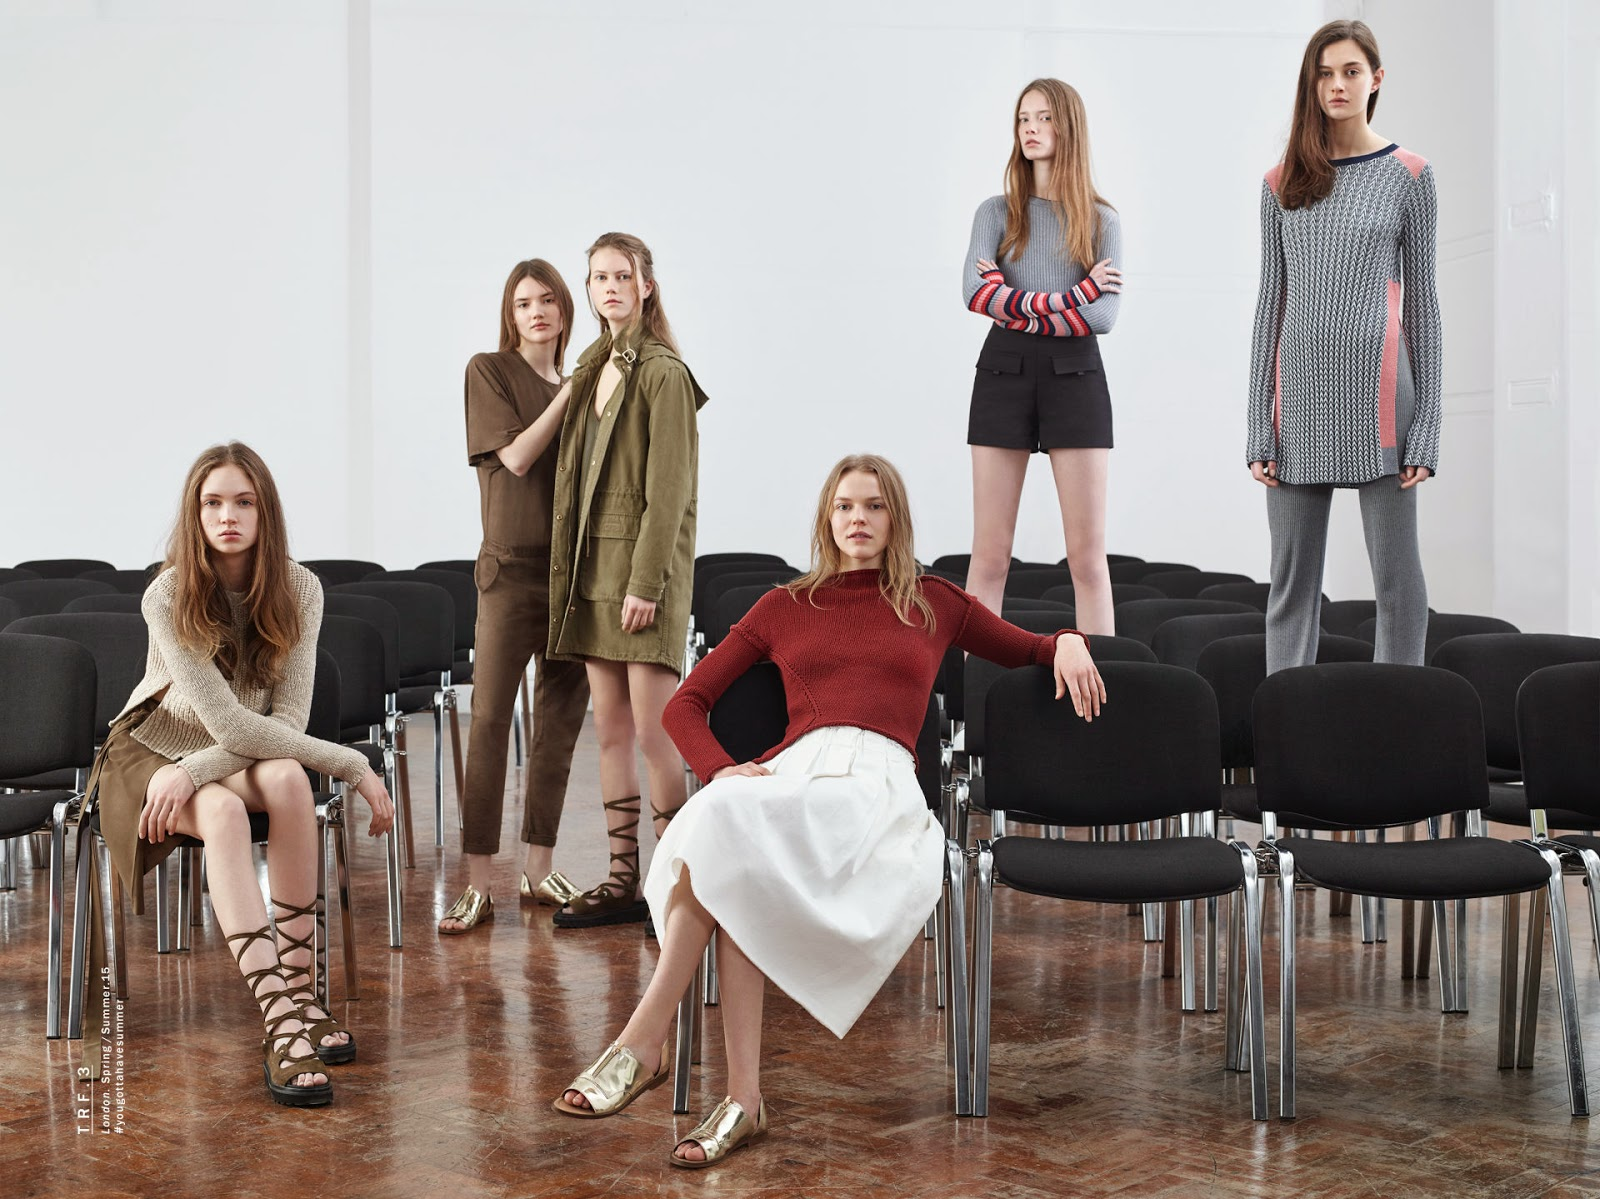 0320413809a0 Το Zara TRF ή Zara Trafaluc προσφέρει πάντα πιο νεανικες, πιο ζωντανές  συλλογές και απευθύνεται σε νεαρές γυναίκες που βρίσκονται στην εφηβική  ηλικία.